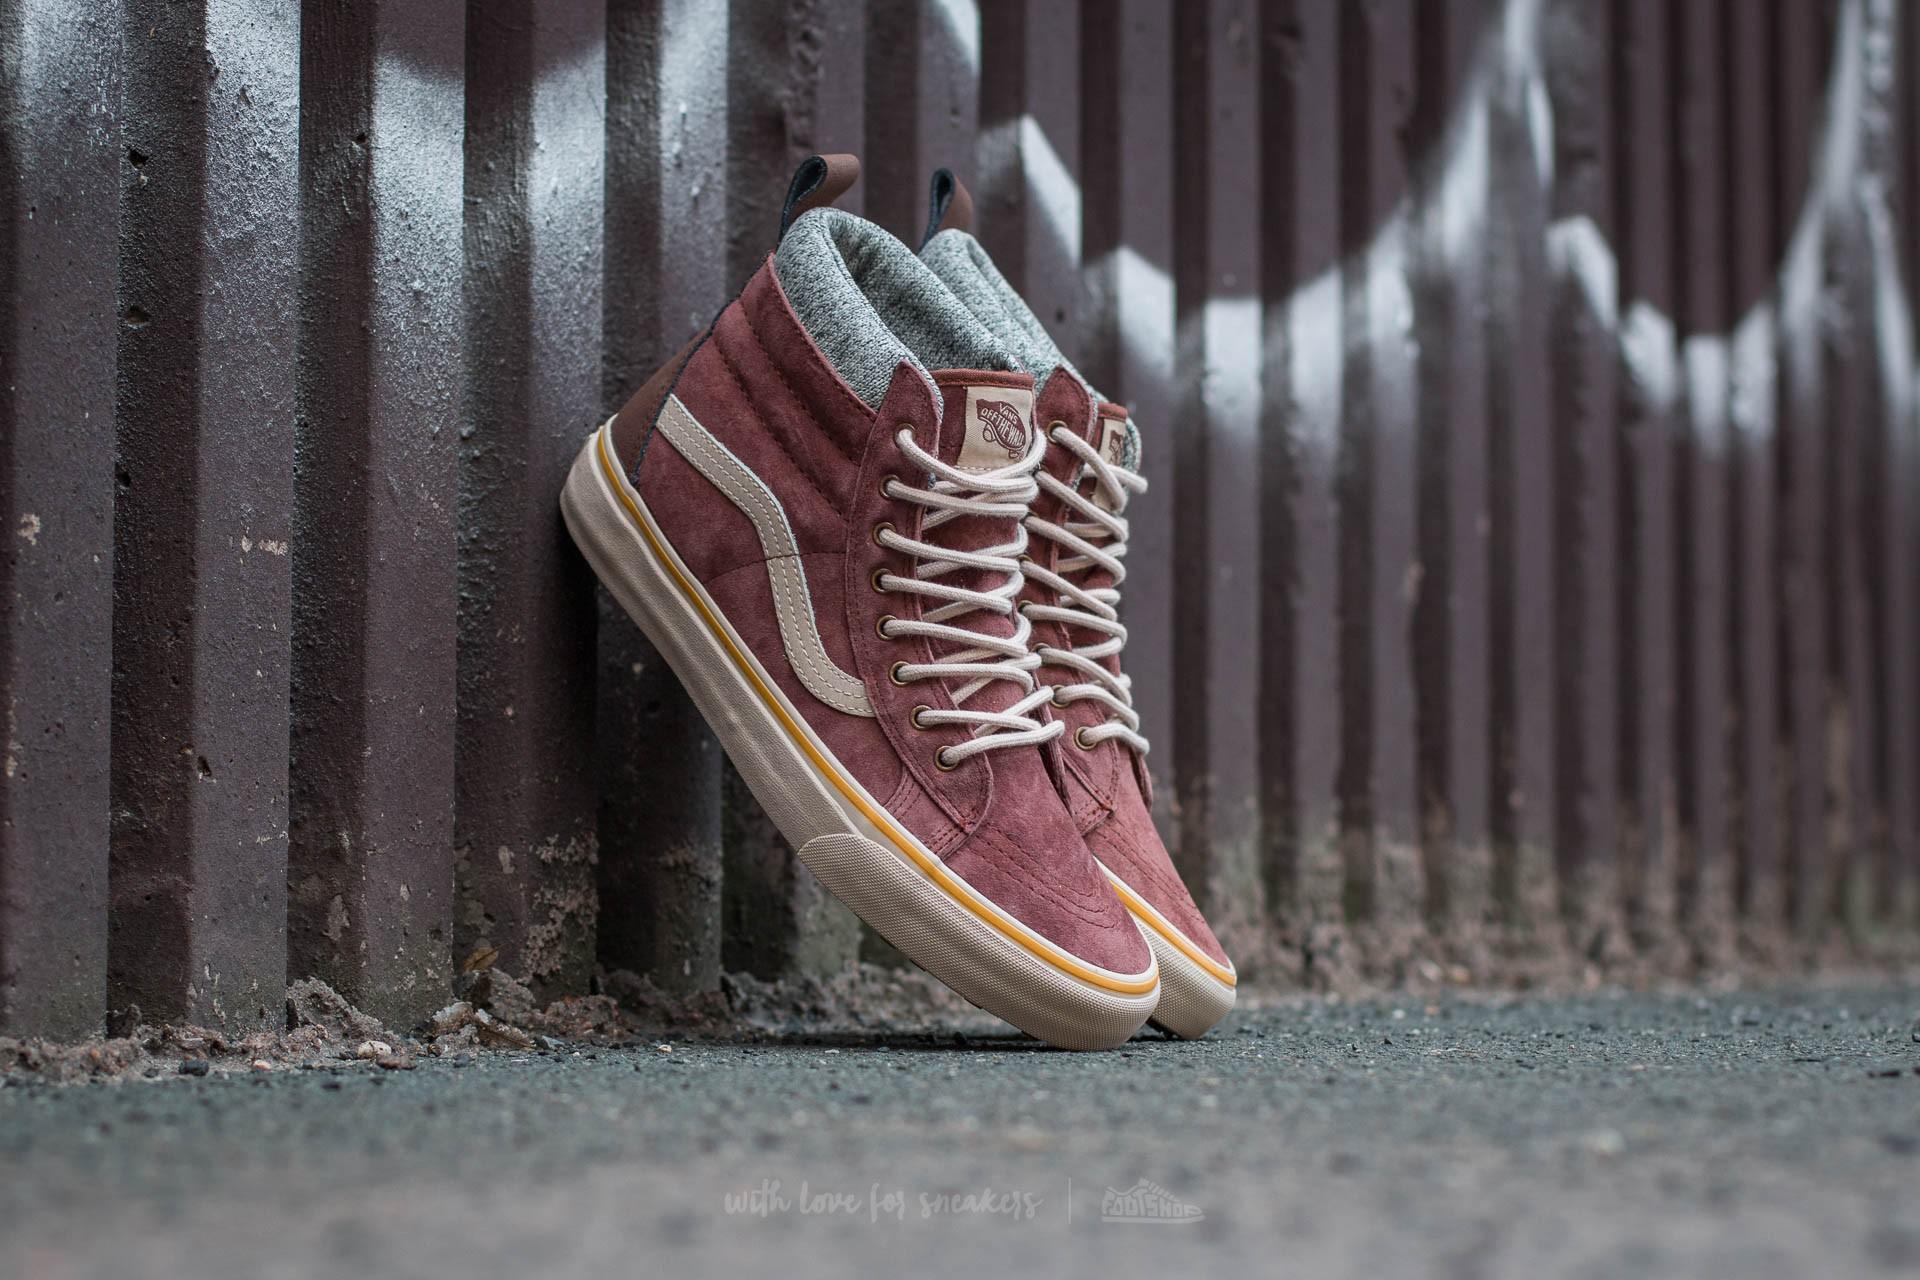 Vans Sk8-Hi MTE DX Cappuccino/ Hummus   Footshop